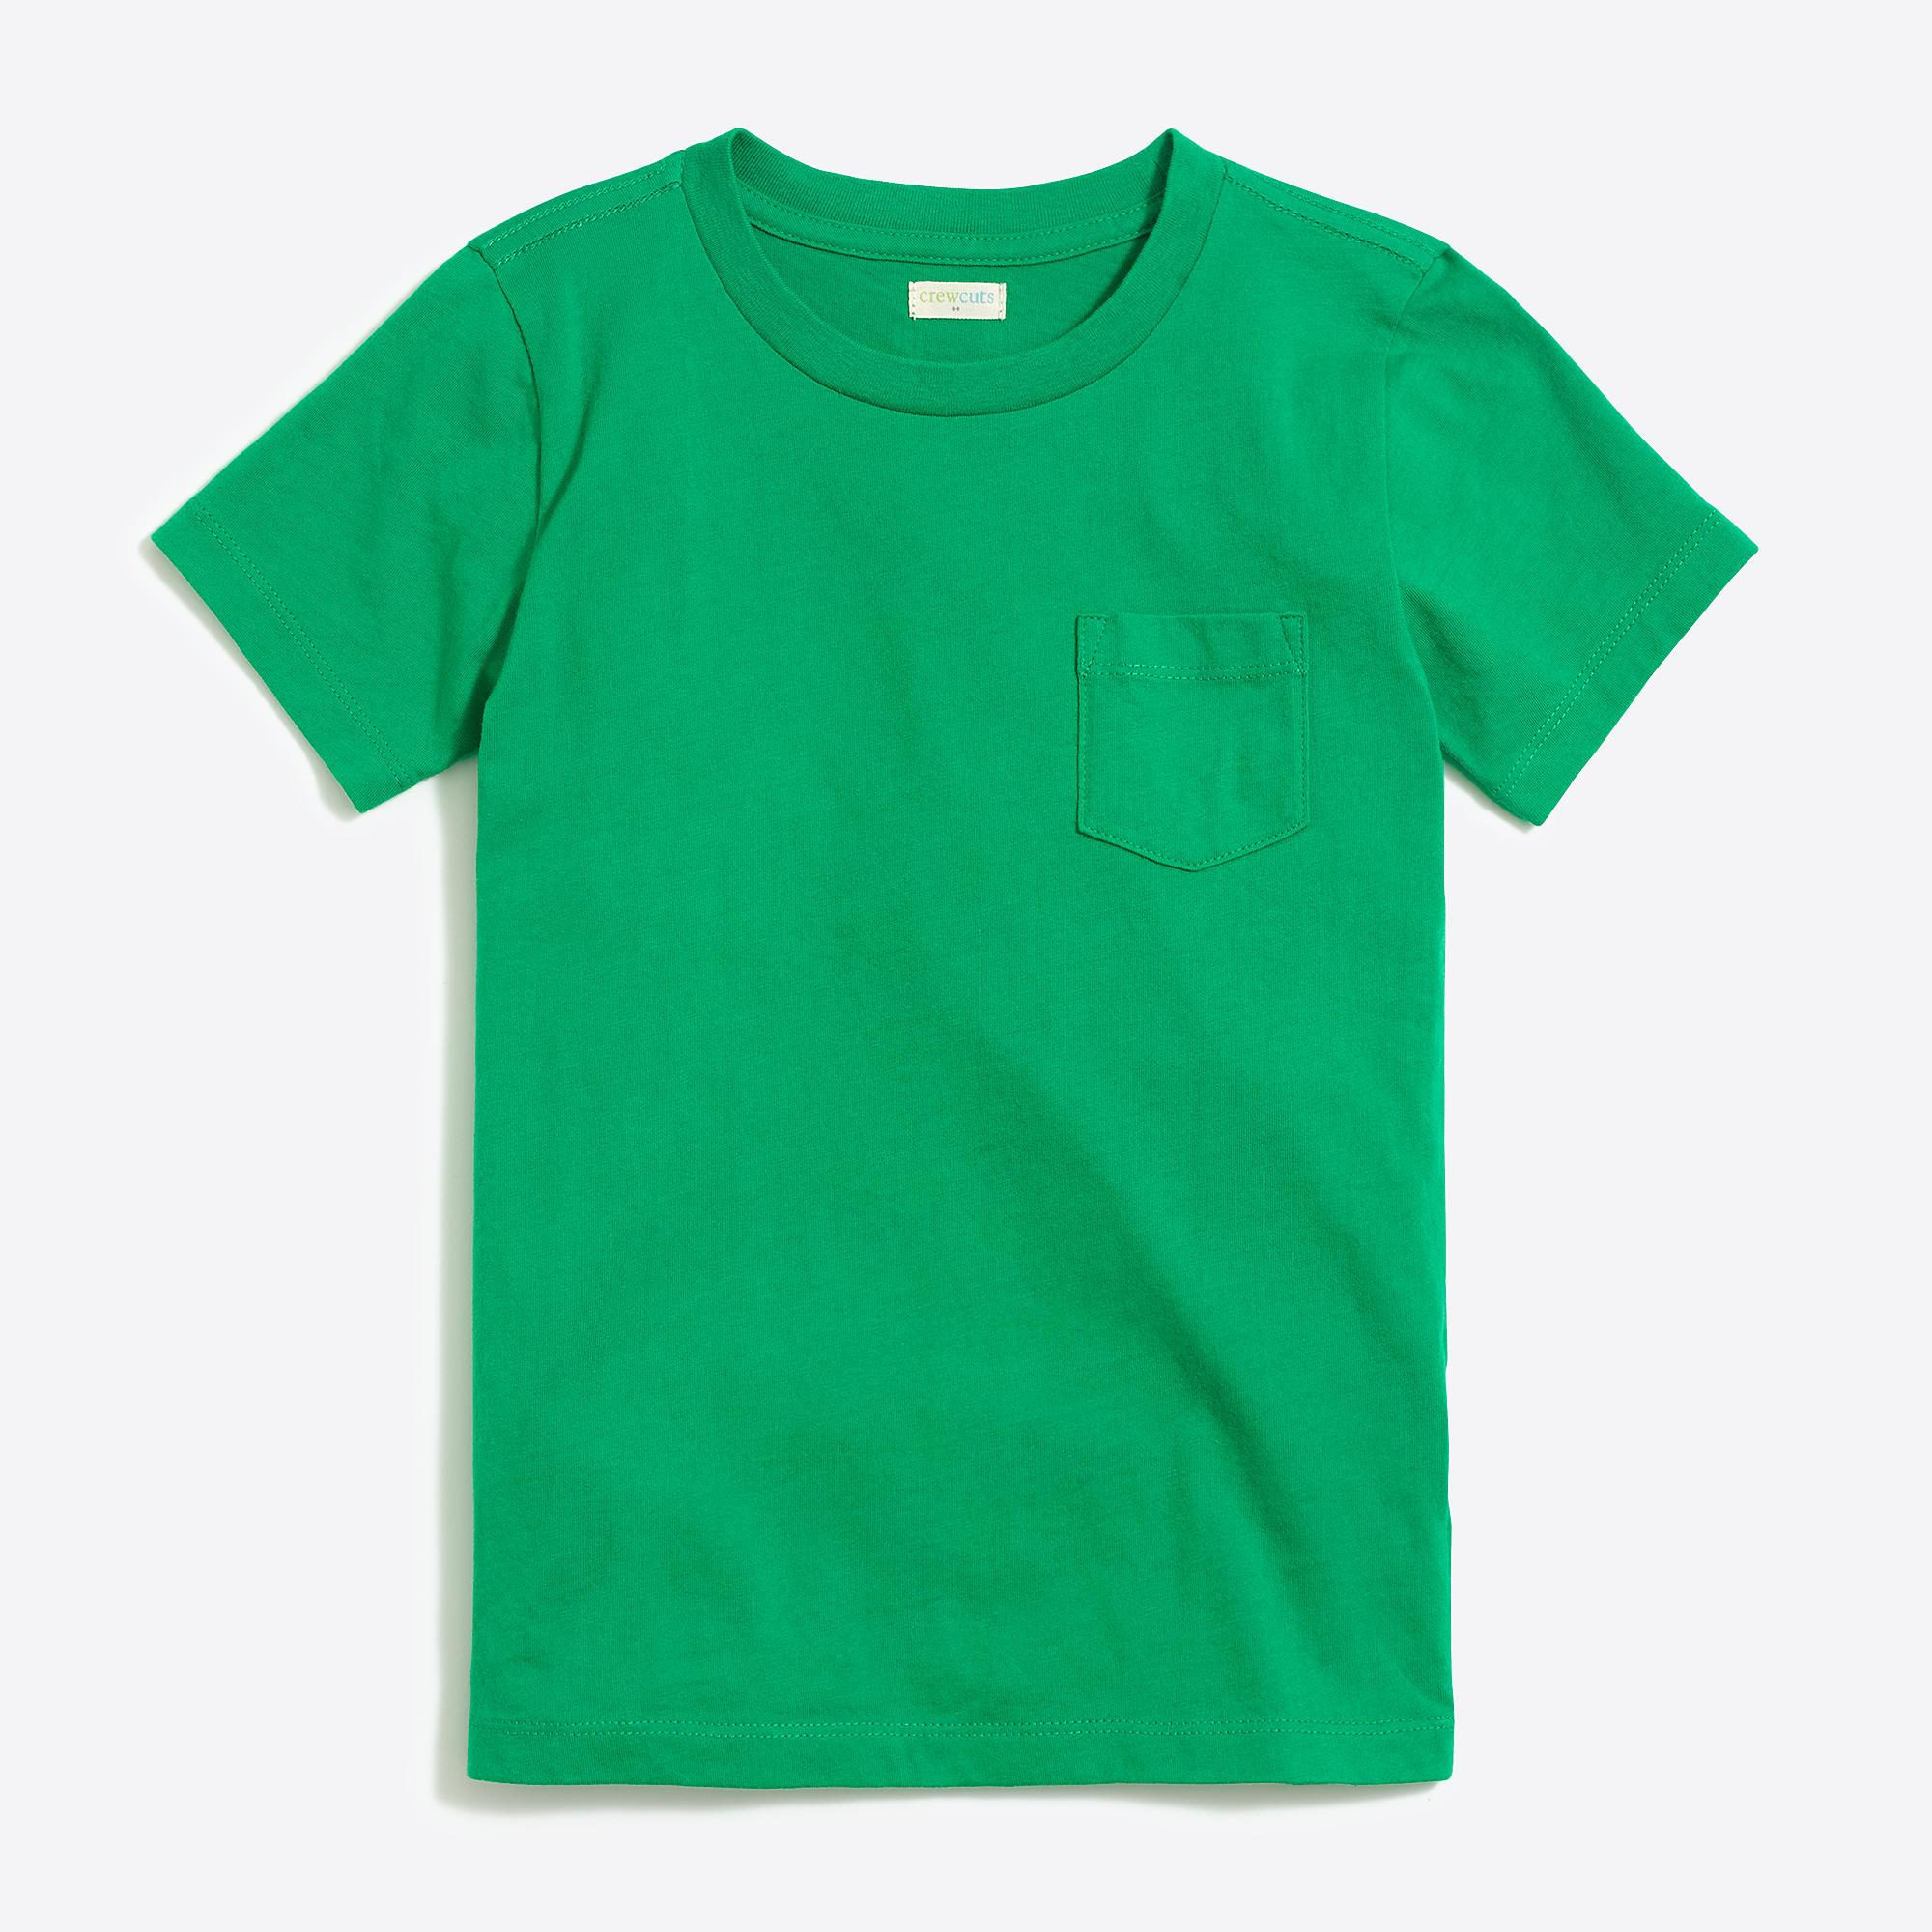 Boys 39 short sleeve jersey pocket t shirt boys 39 tees j for Boys pocket t shirt